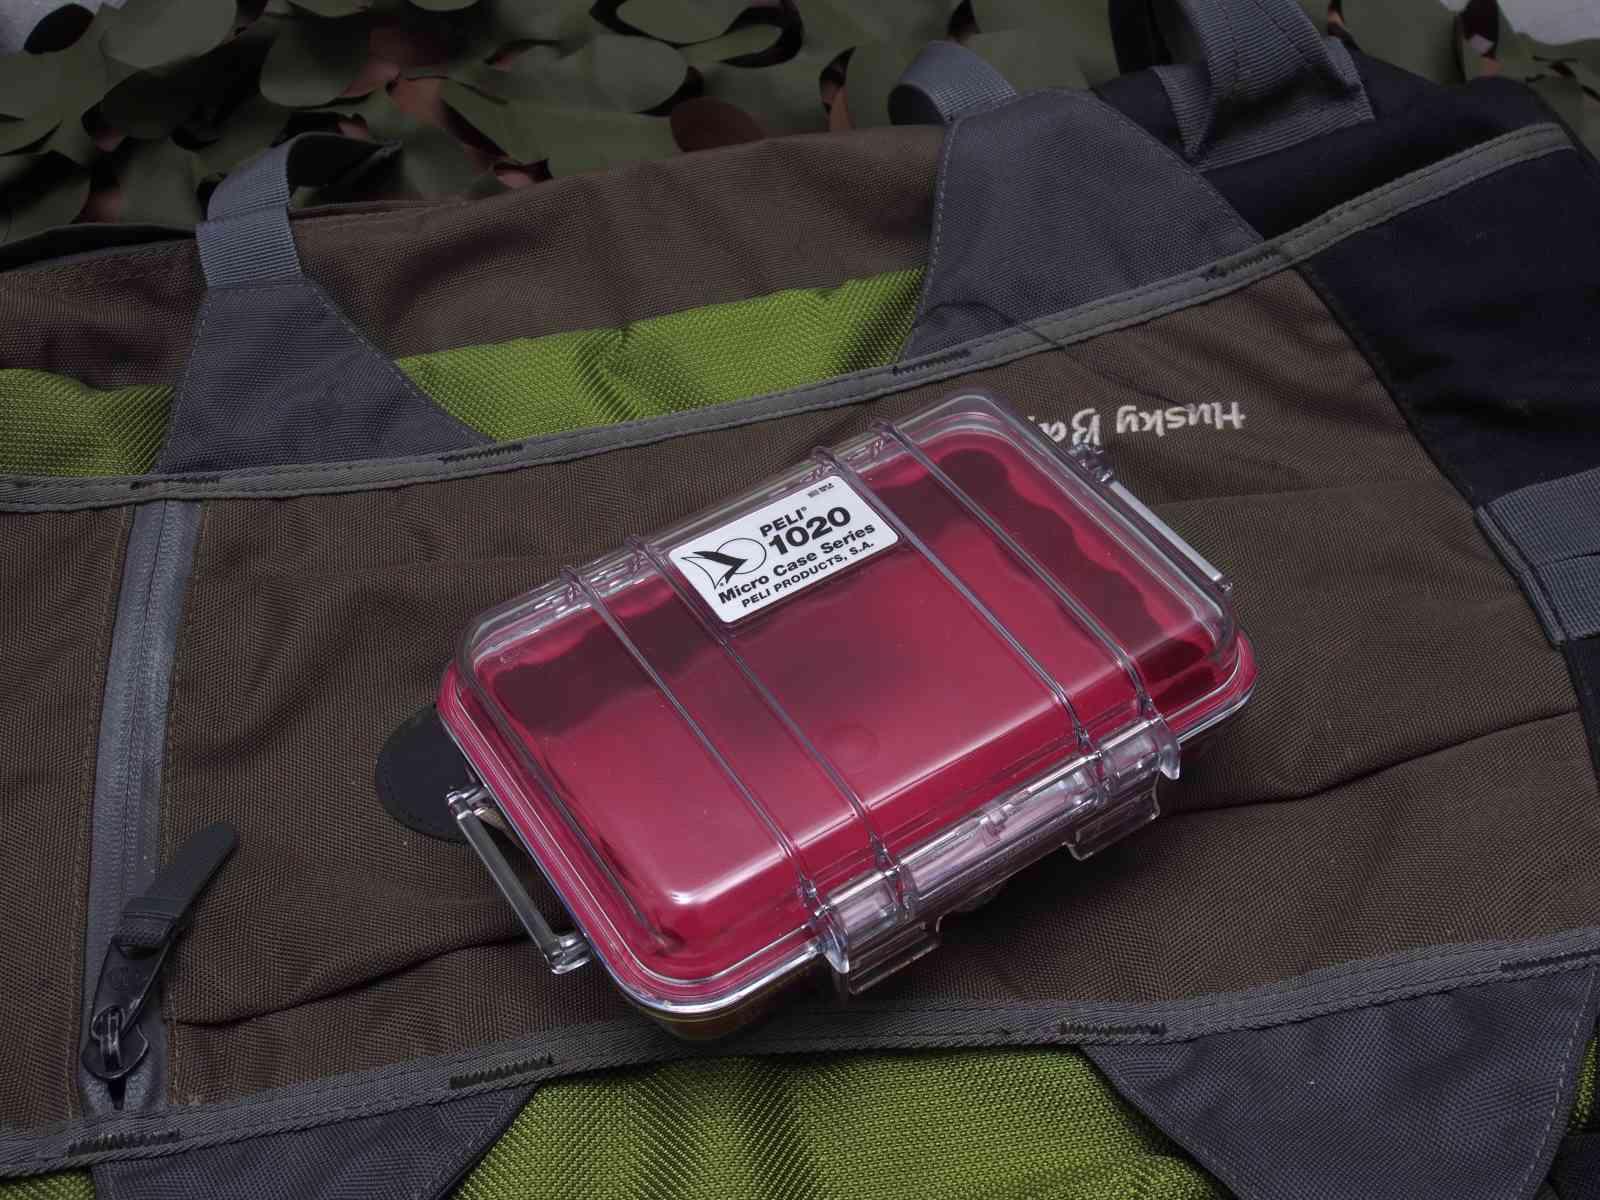 Mein Survival-Kit - Peli Box 1020